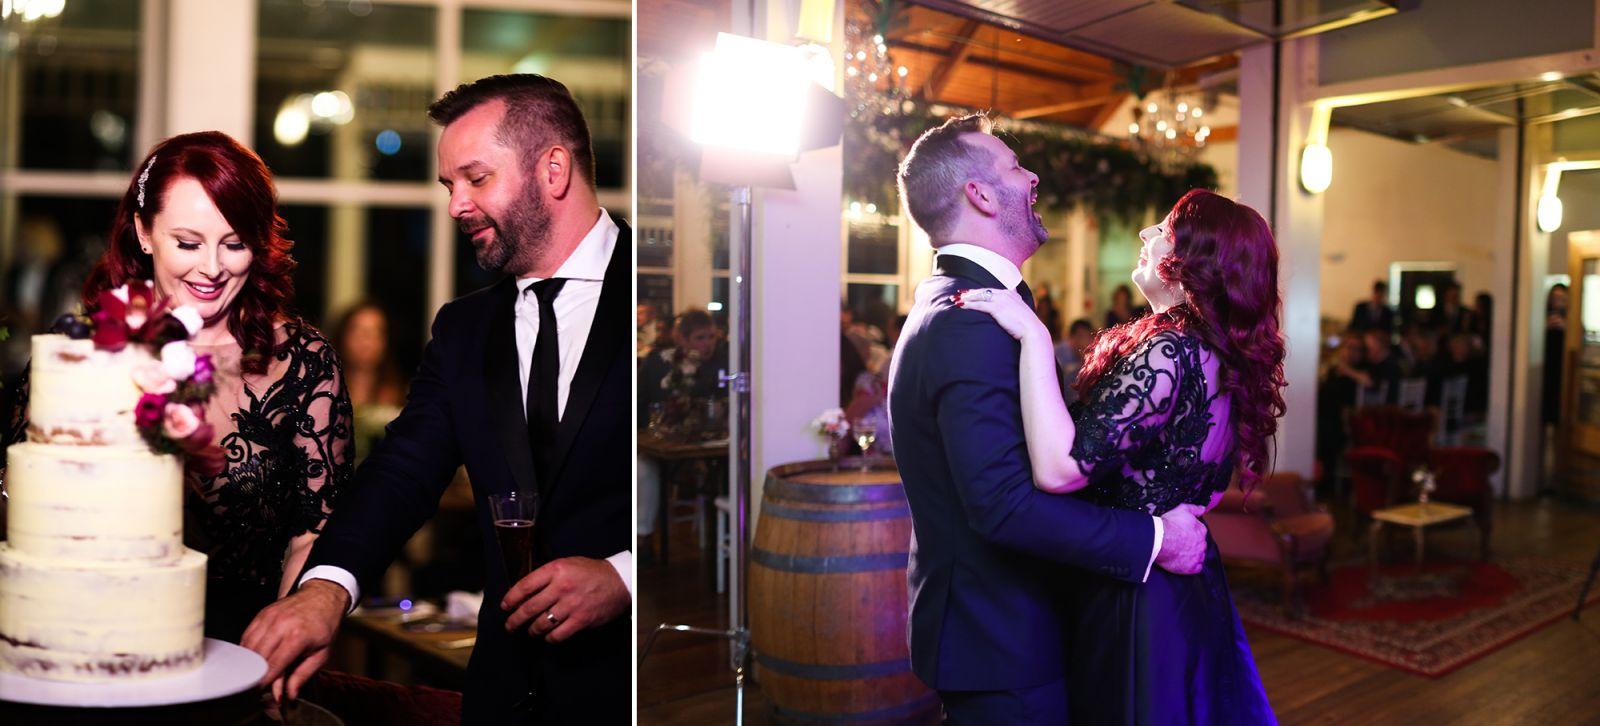 19_wedding-celebrations-captured-by-hunter-valley-photographer